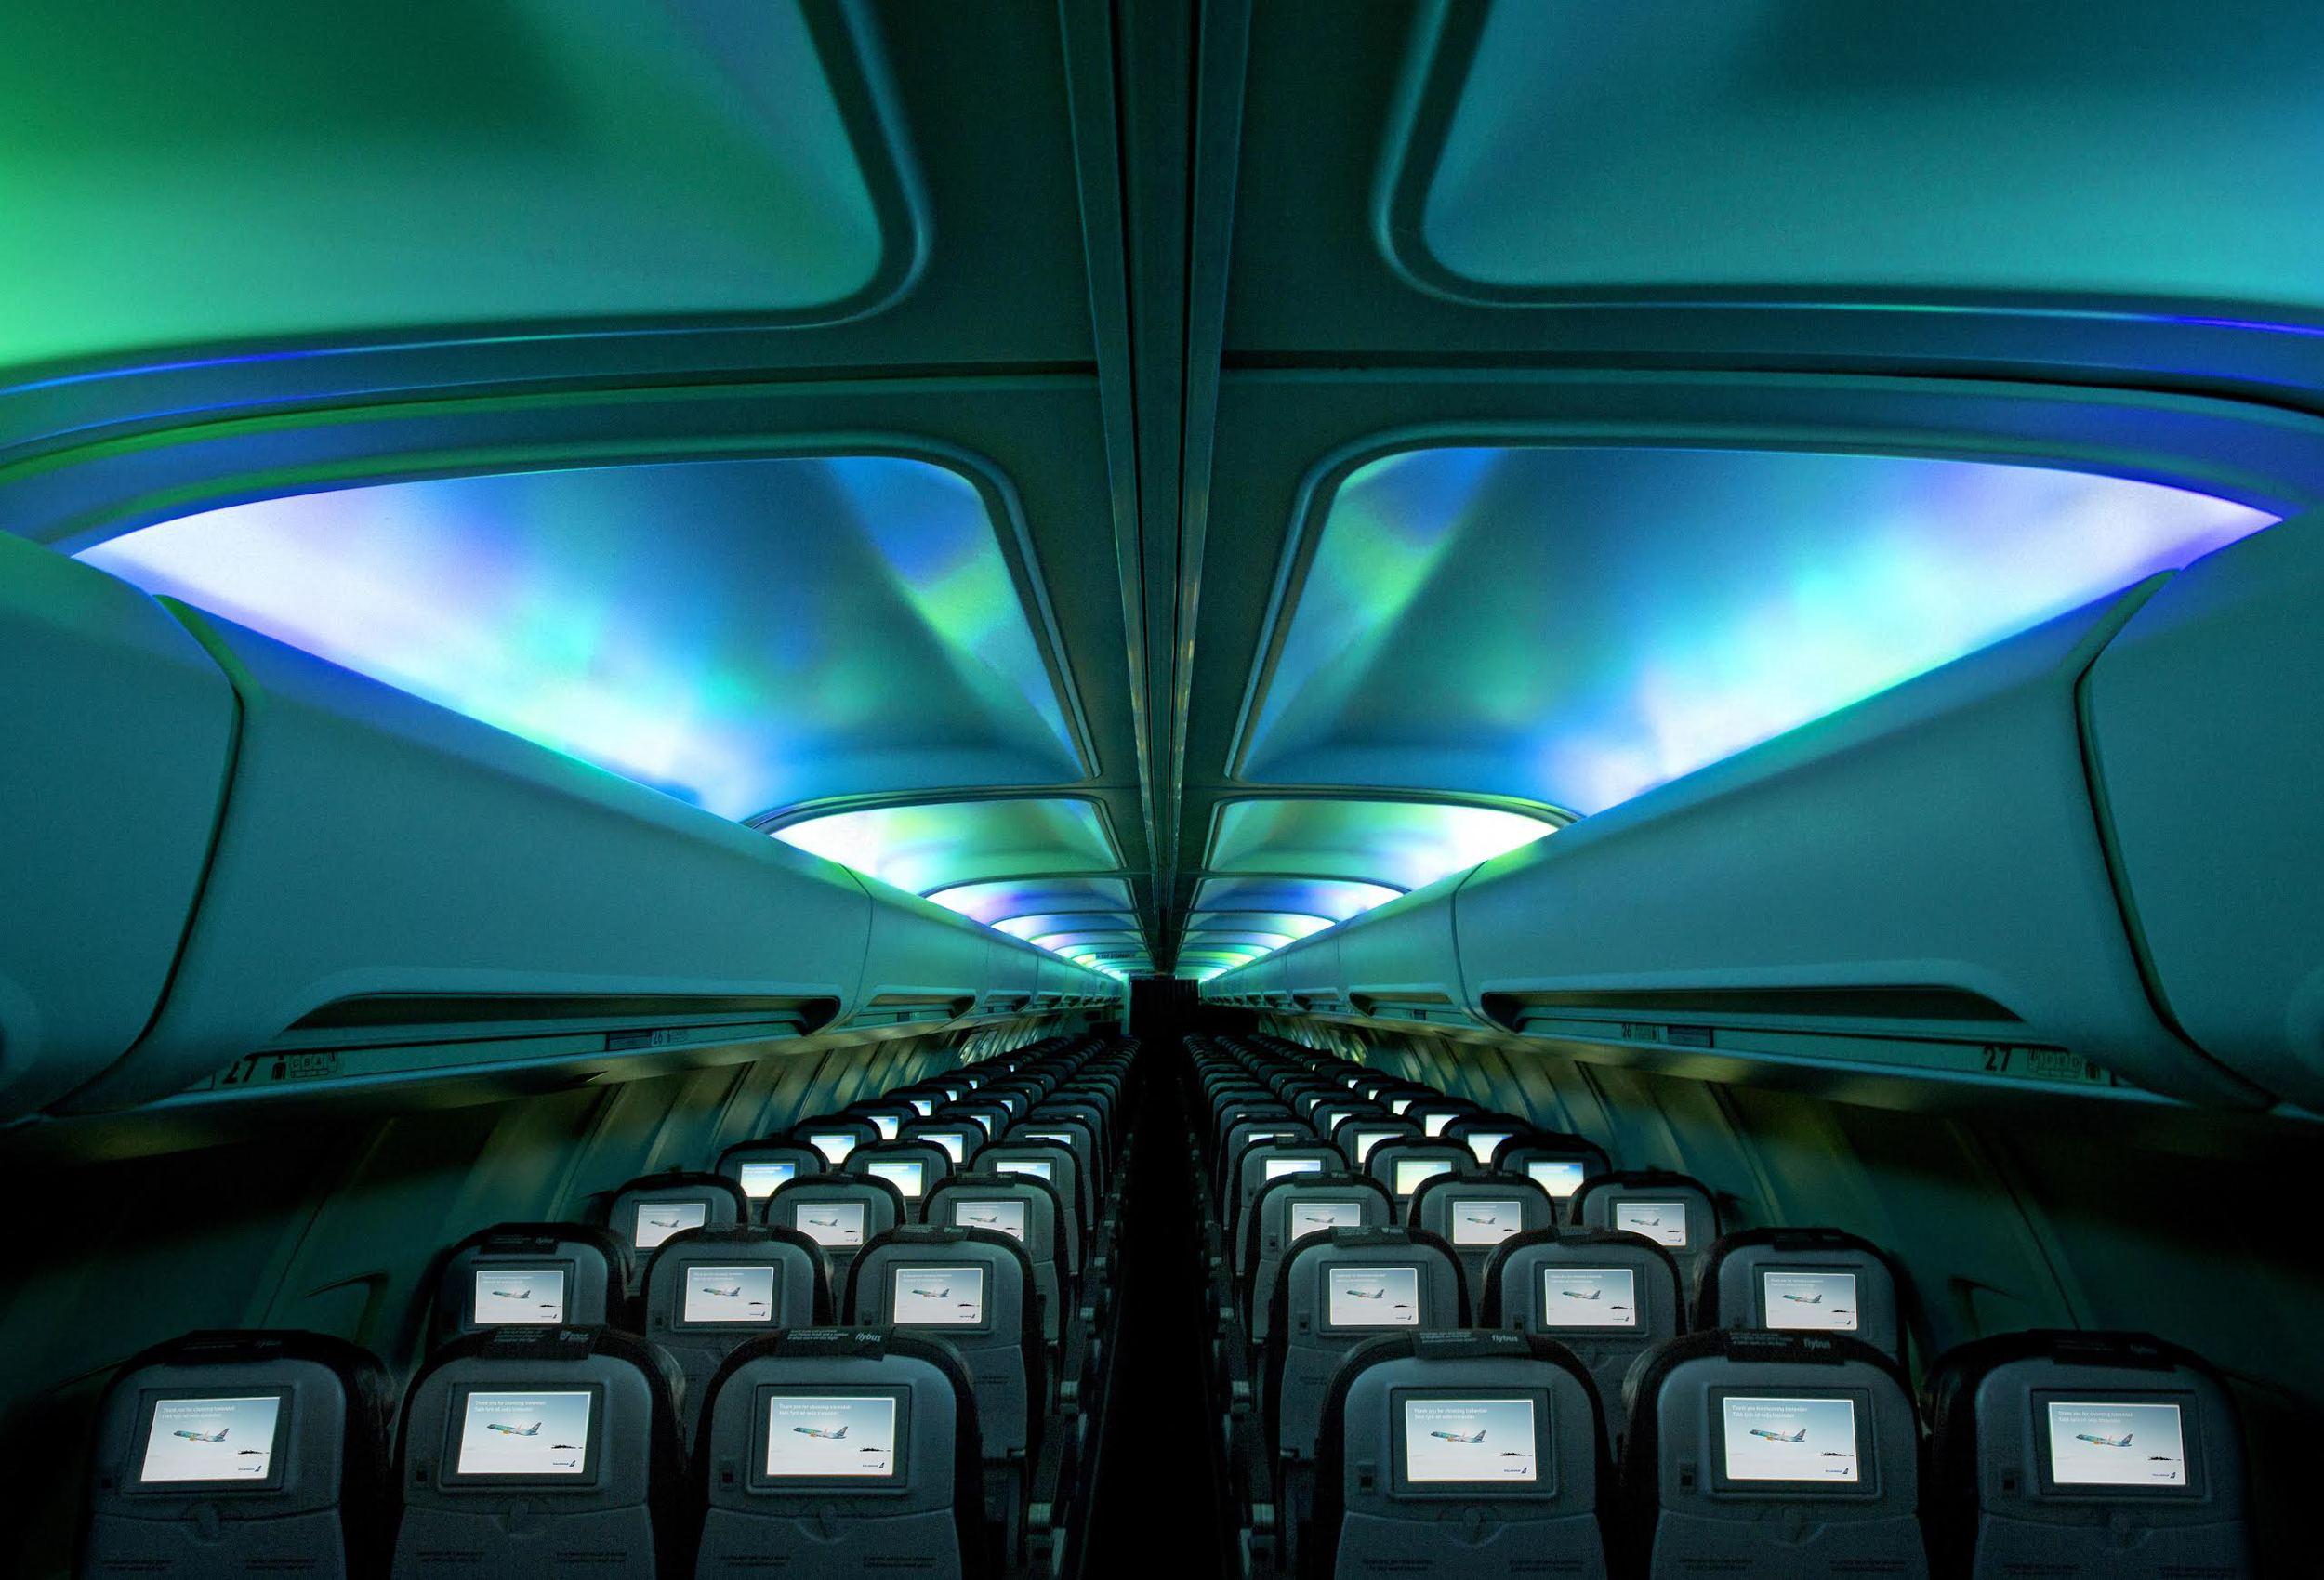 Amazing Hekla Aurora ceiling on Iceland Air plane via Iceland Air